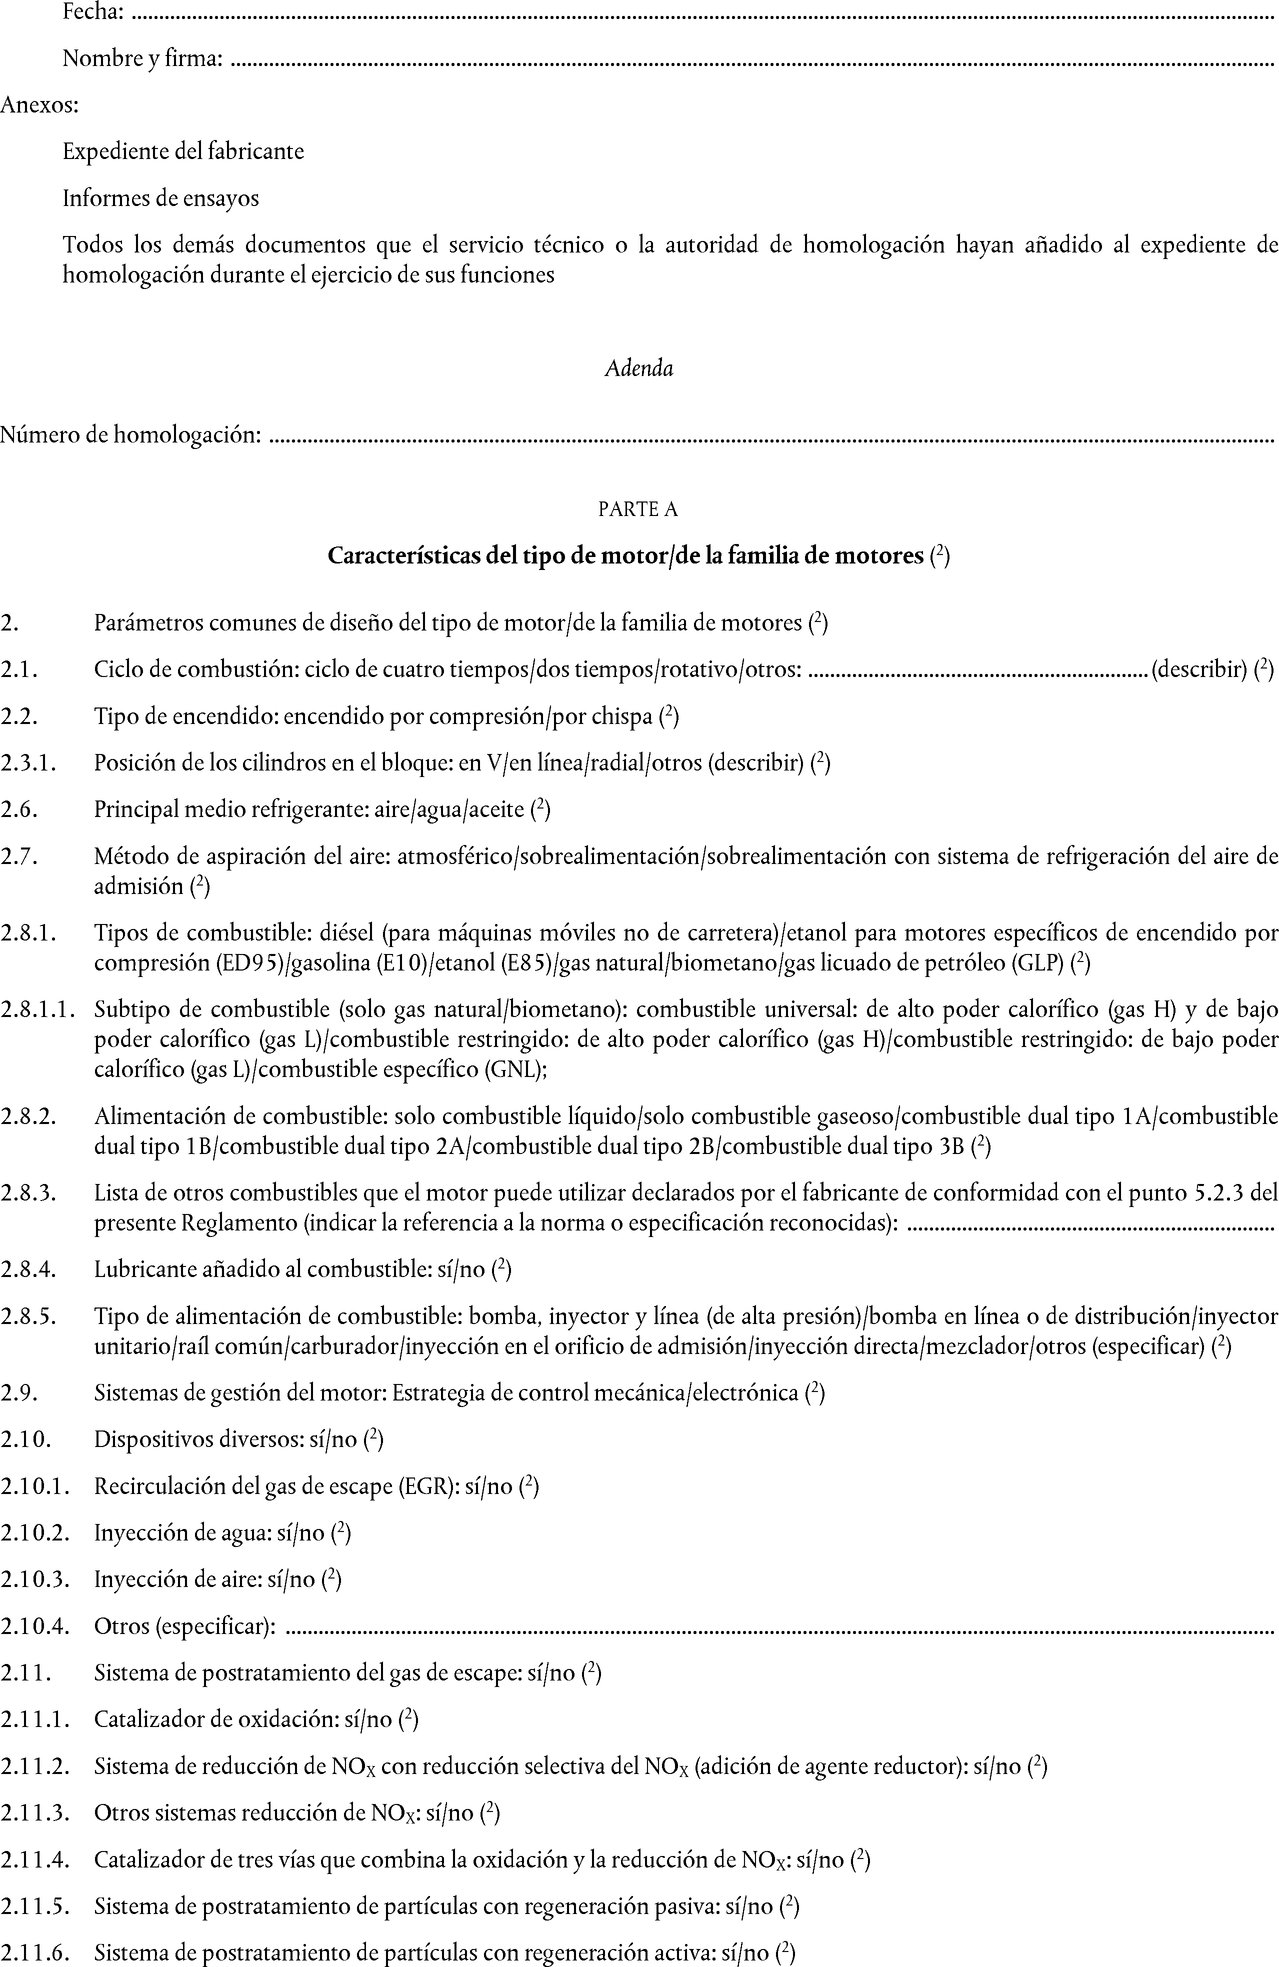 Imagen: https://eur-lex.europa.eu/resource.html?uri=uriserv:OJ.L_.2019.072.01.0081.01.SPA.xhtml.L_2019072ES.01010501.tif.jpg